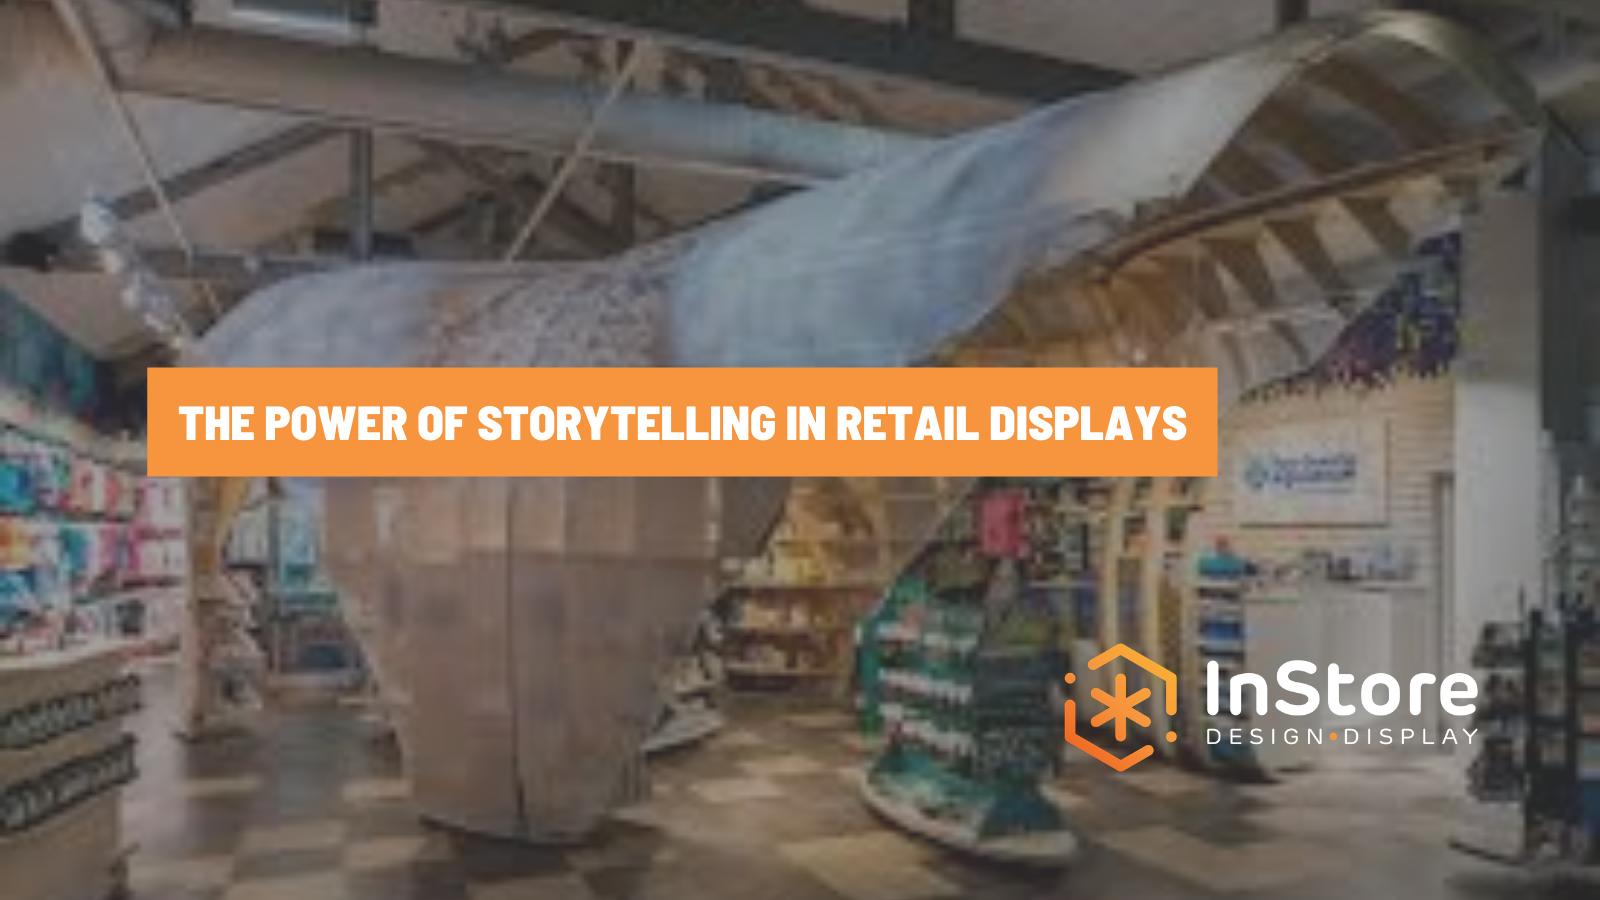 The Power of Storytelling in Retail Displays